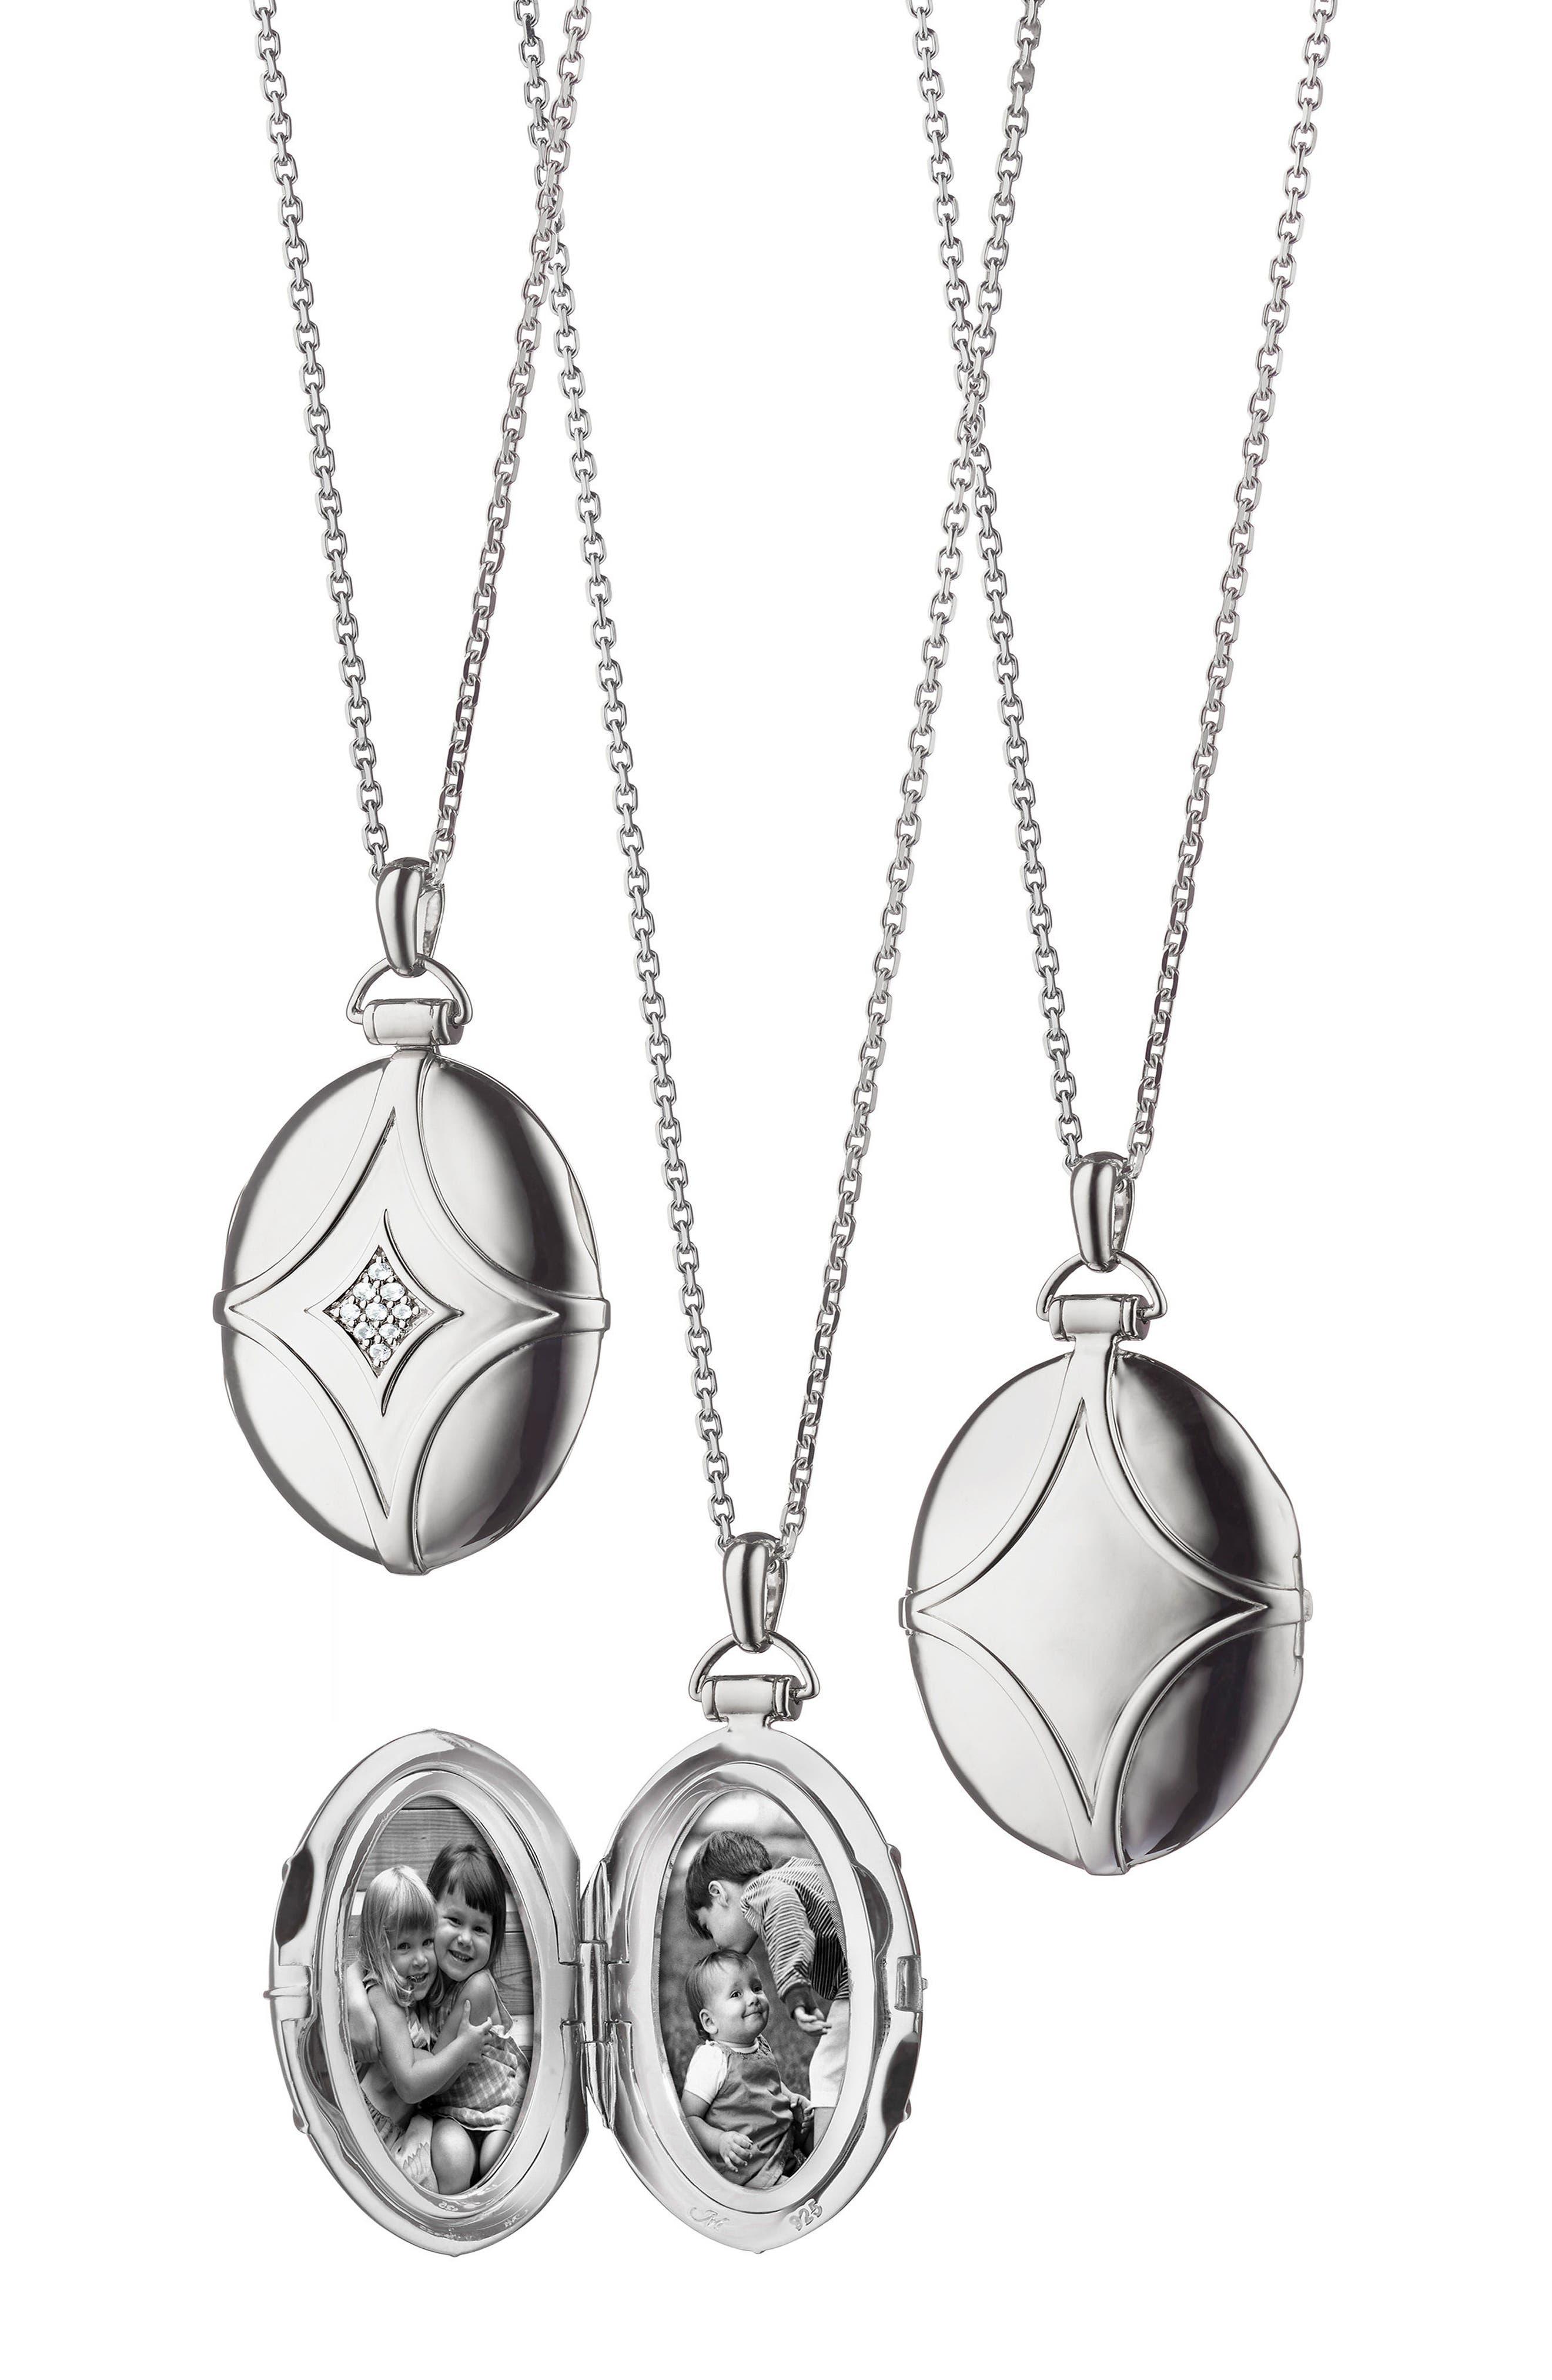 Bridle Locket Necklace,                         Main,                         color, Sterling Silver